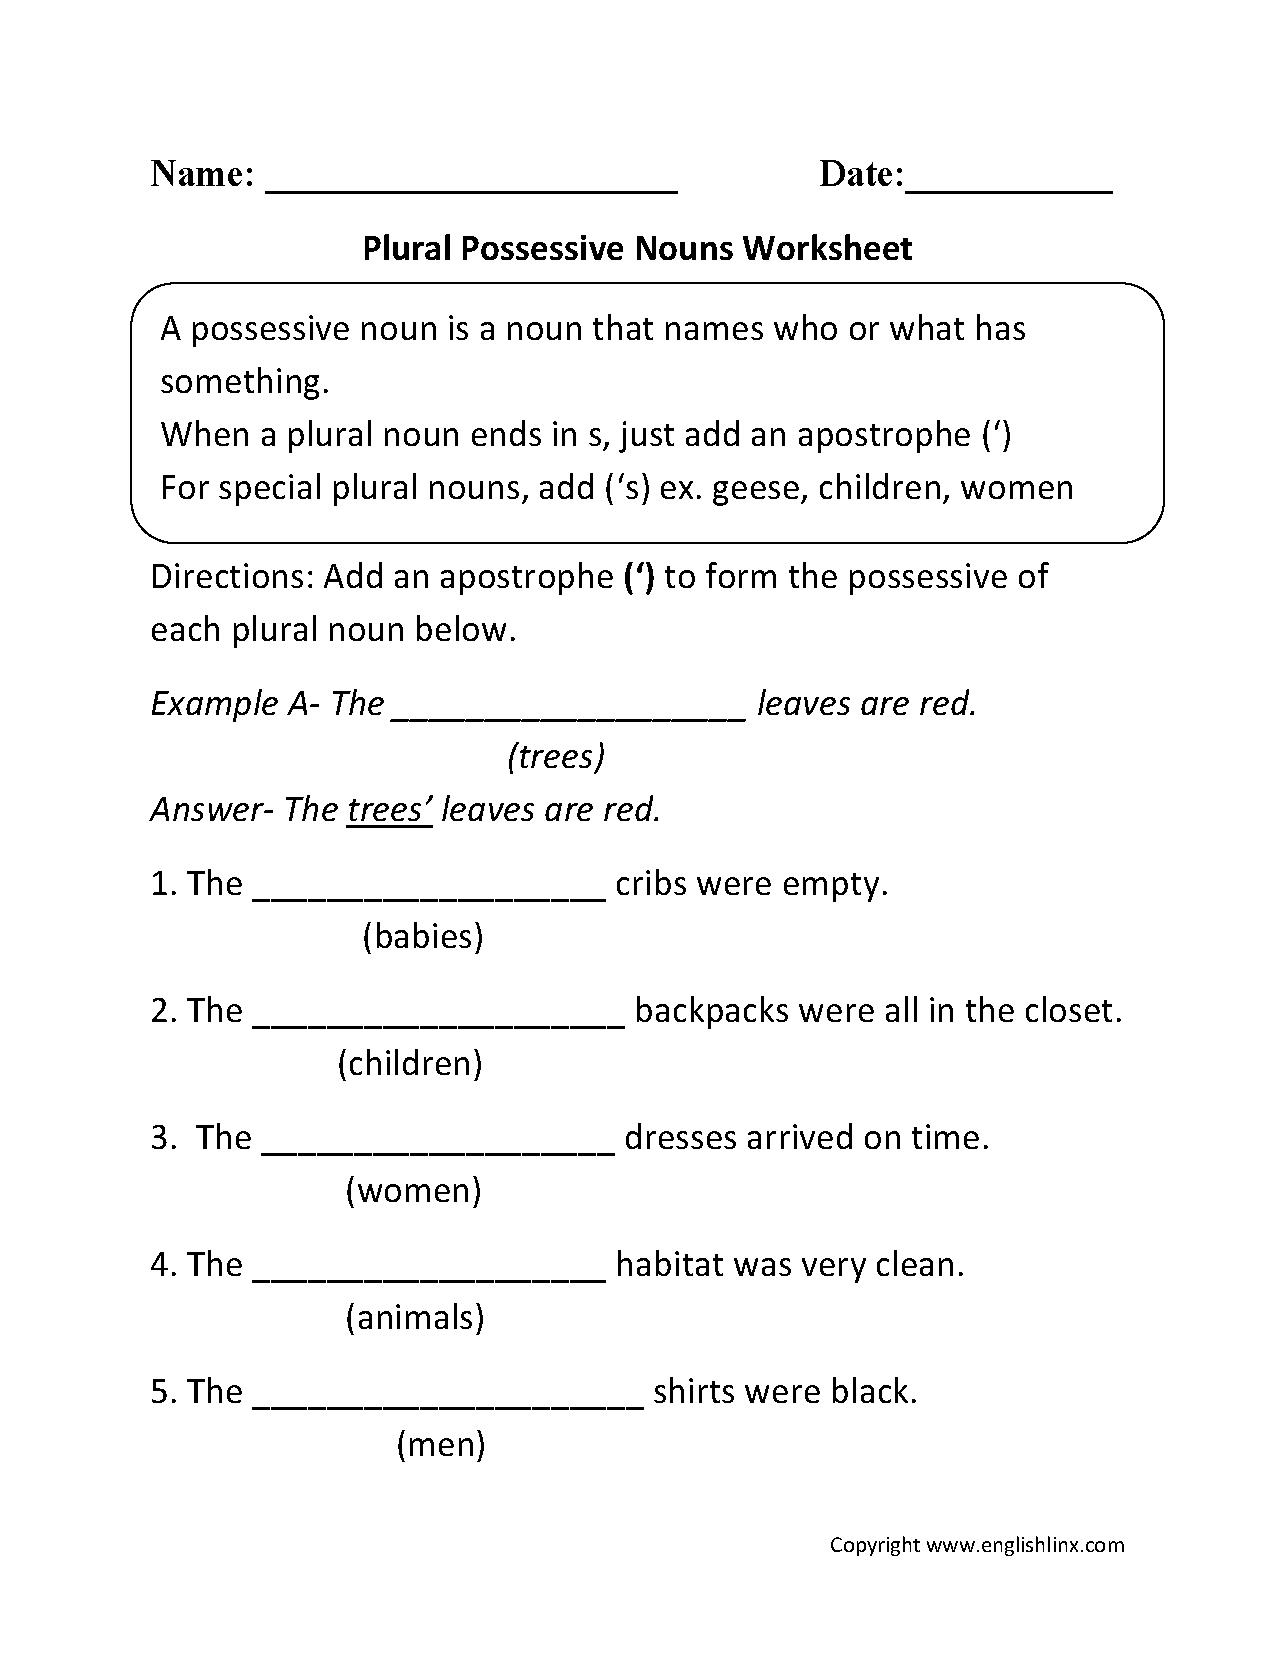 Nouns Worksheets | Possessive Nouns Worksheets | Possessive Pronouns Printable Worksheets